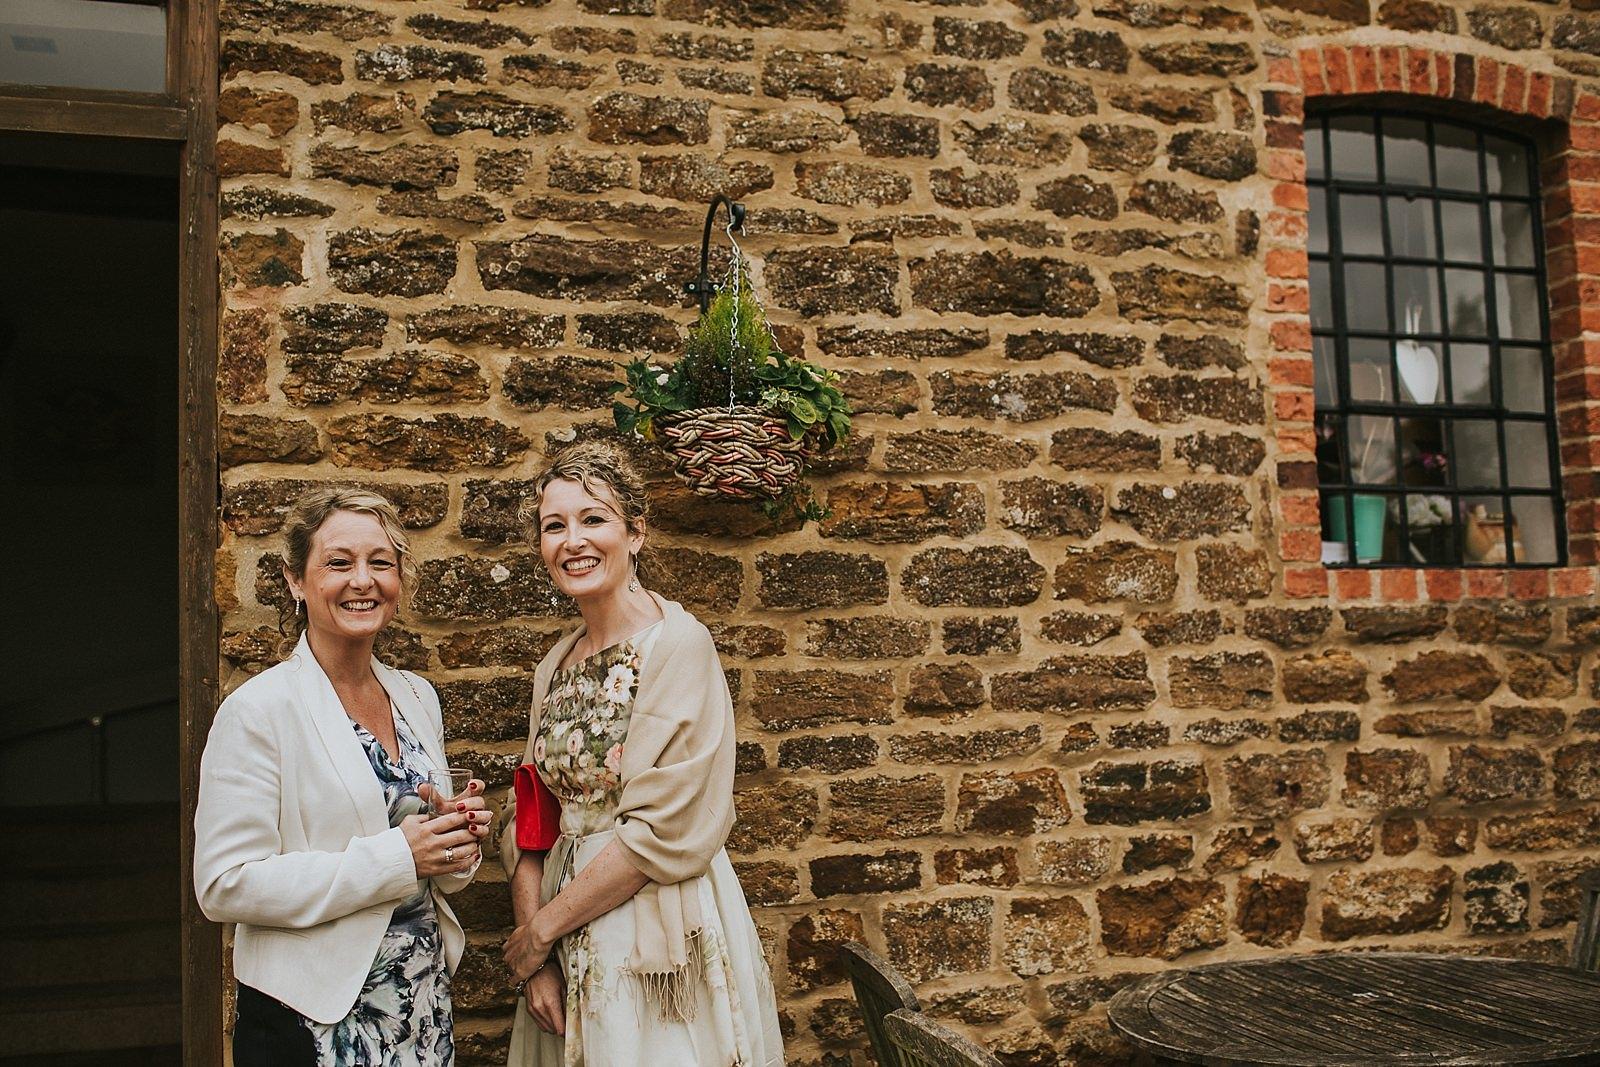 granary-at-fawsly-wedding-paula-stephen-218